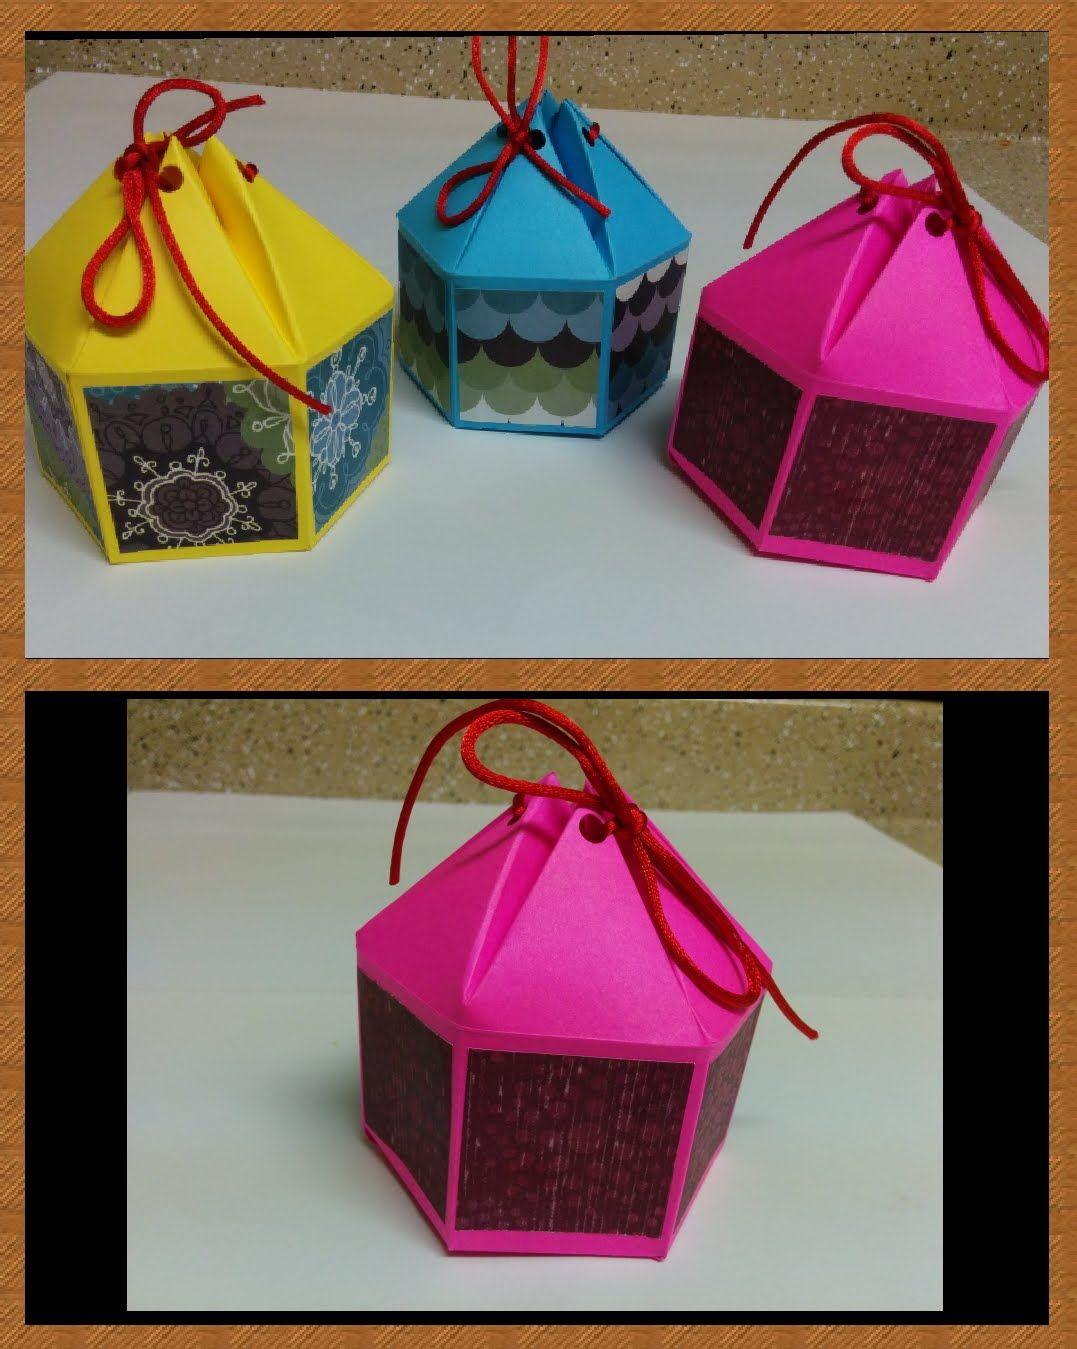 Arts and craft box - Art And Craft How To Make Hexagonal Gift Box